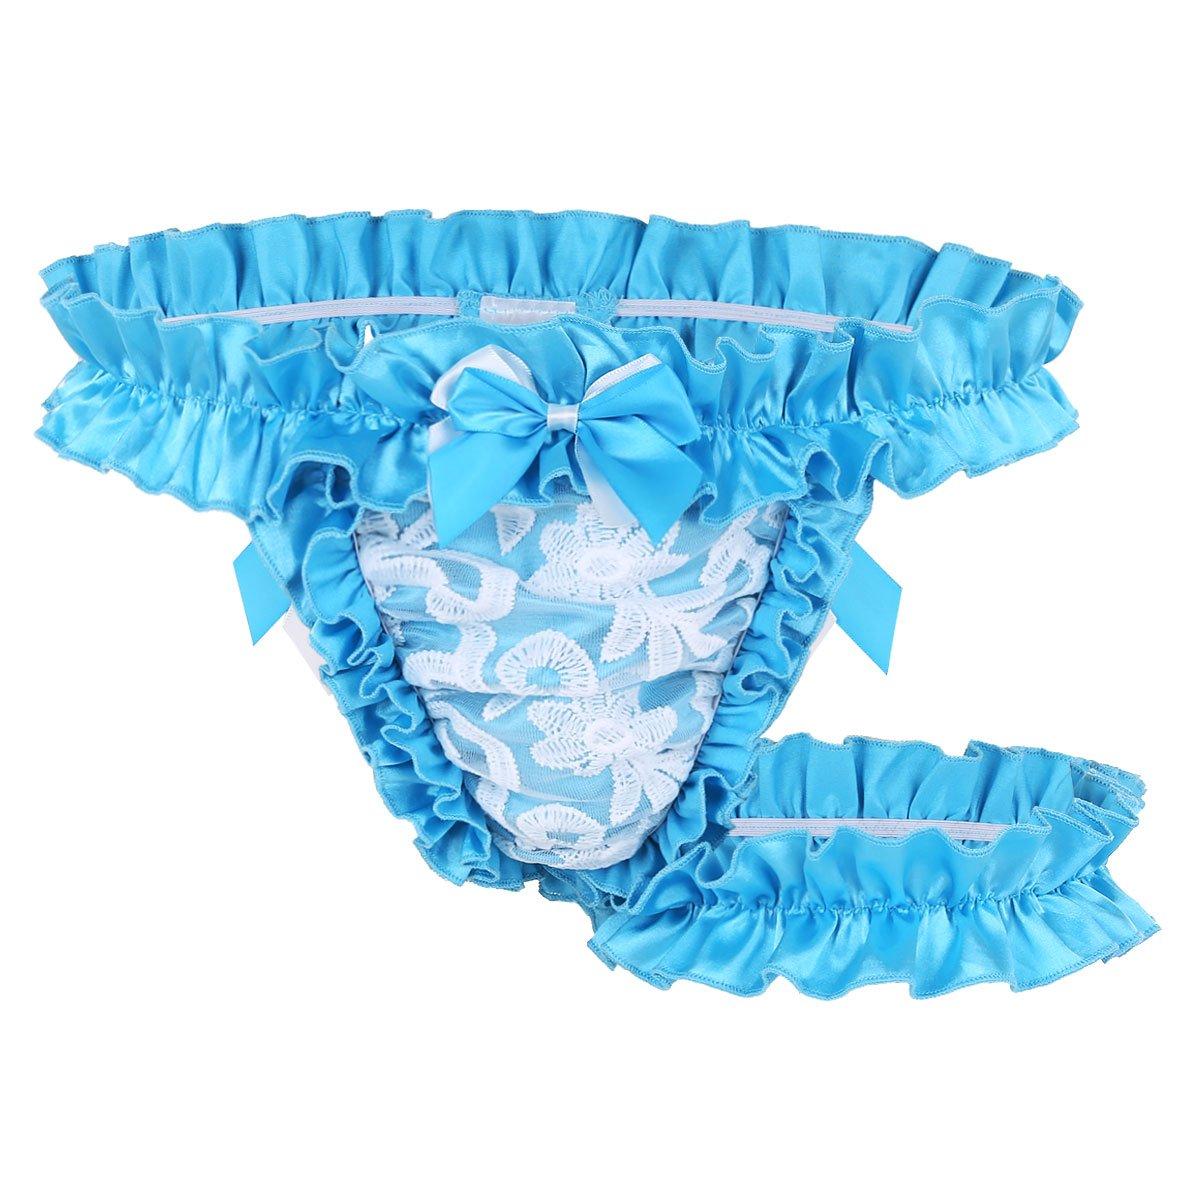 iiniim Herren Slips Elastische Satin Bikini Briefs M/änner Unterw/äsche Tanga Schl/üpfer Panties M-XXL